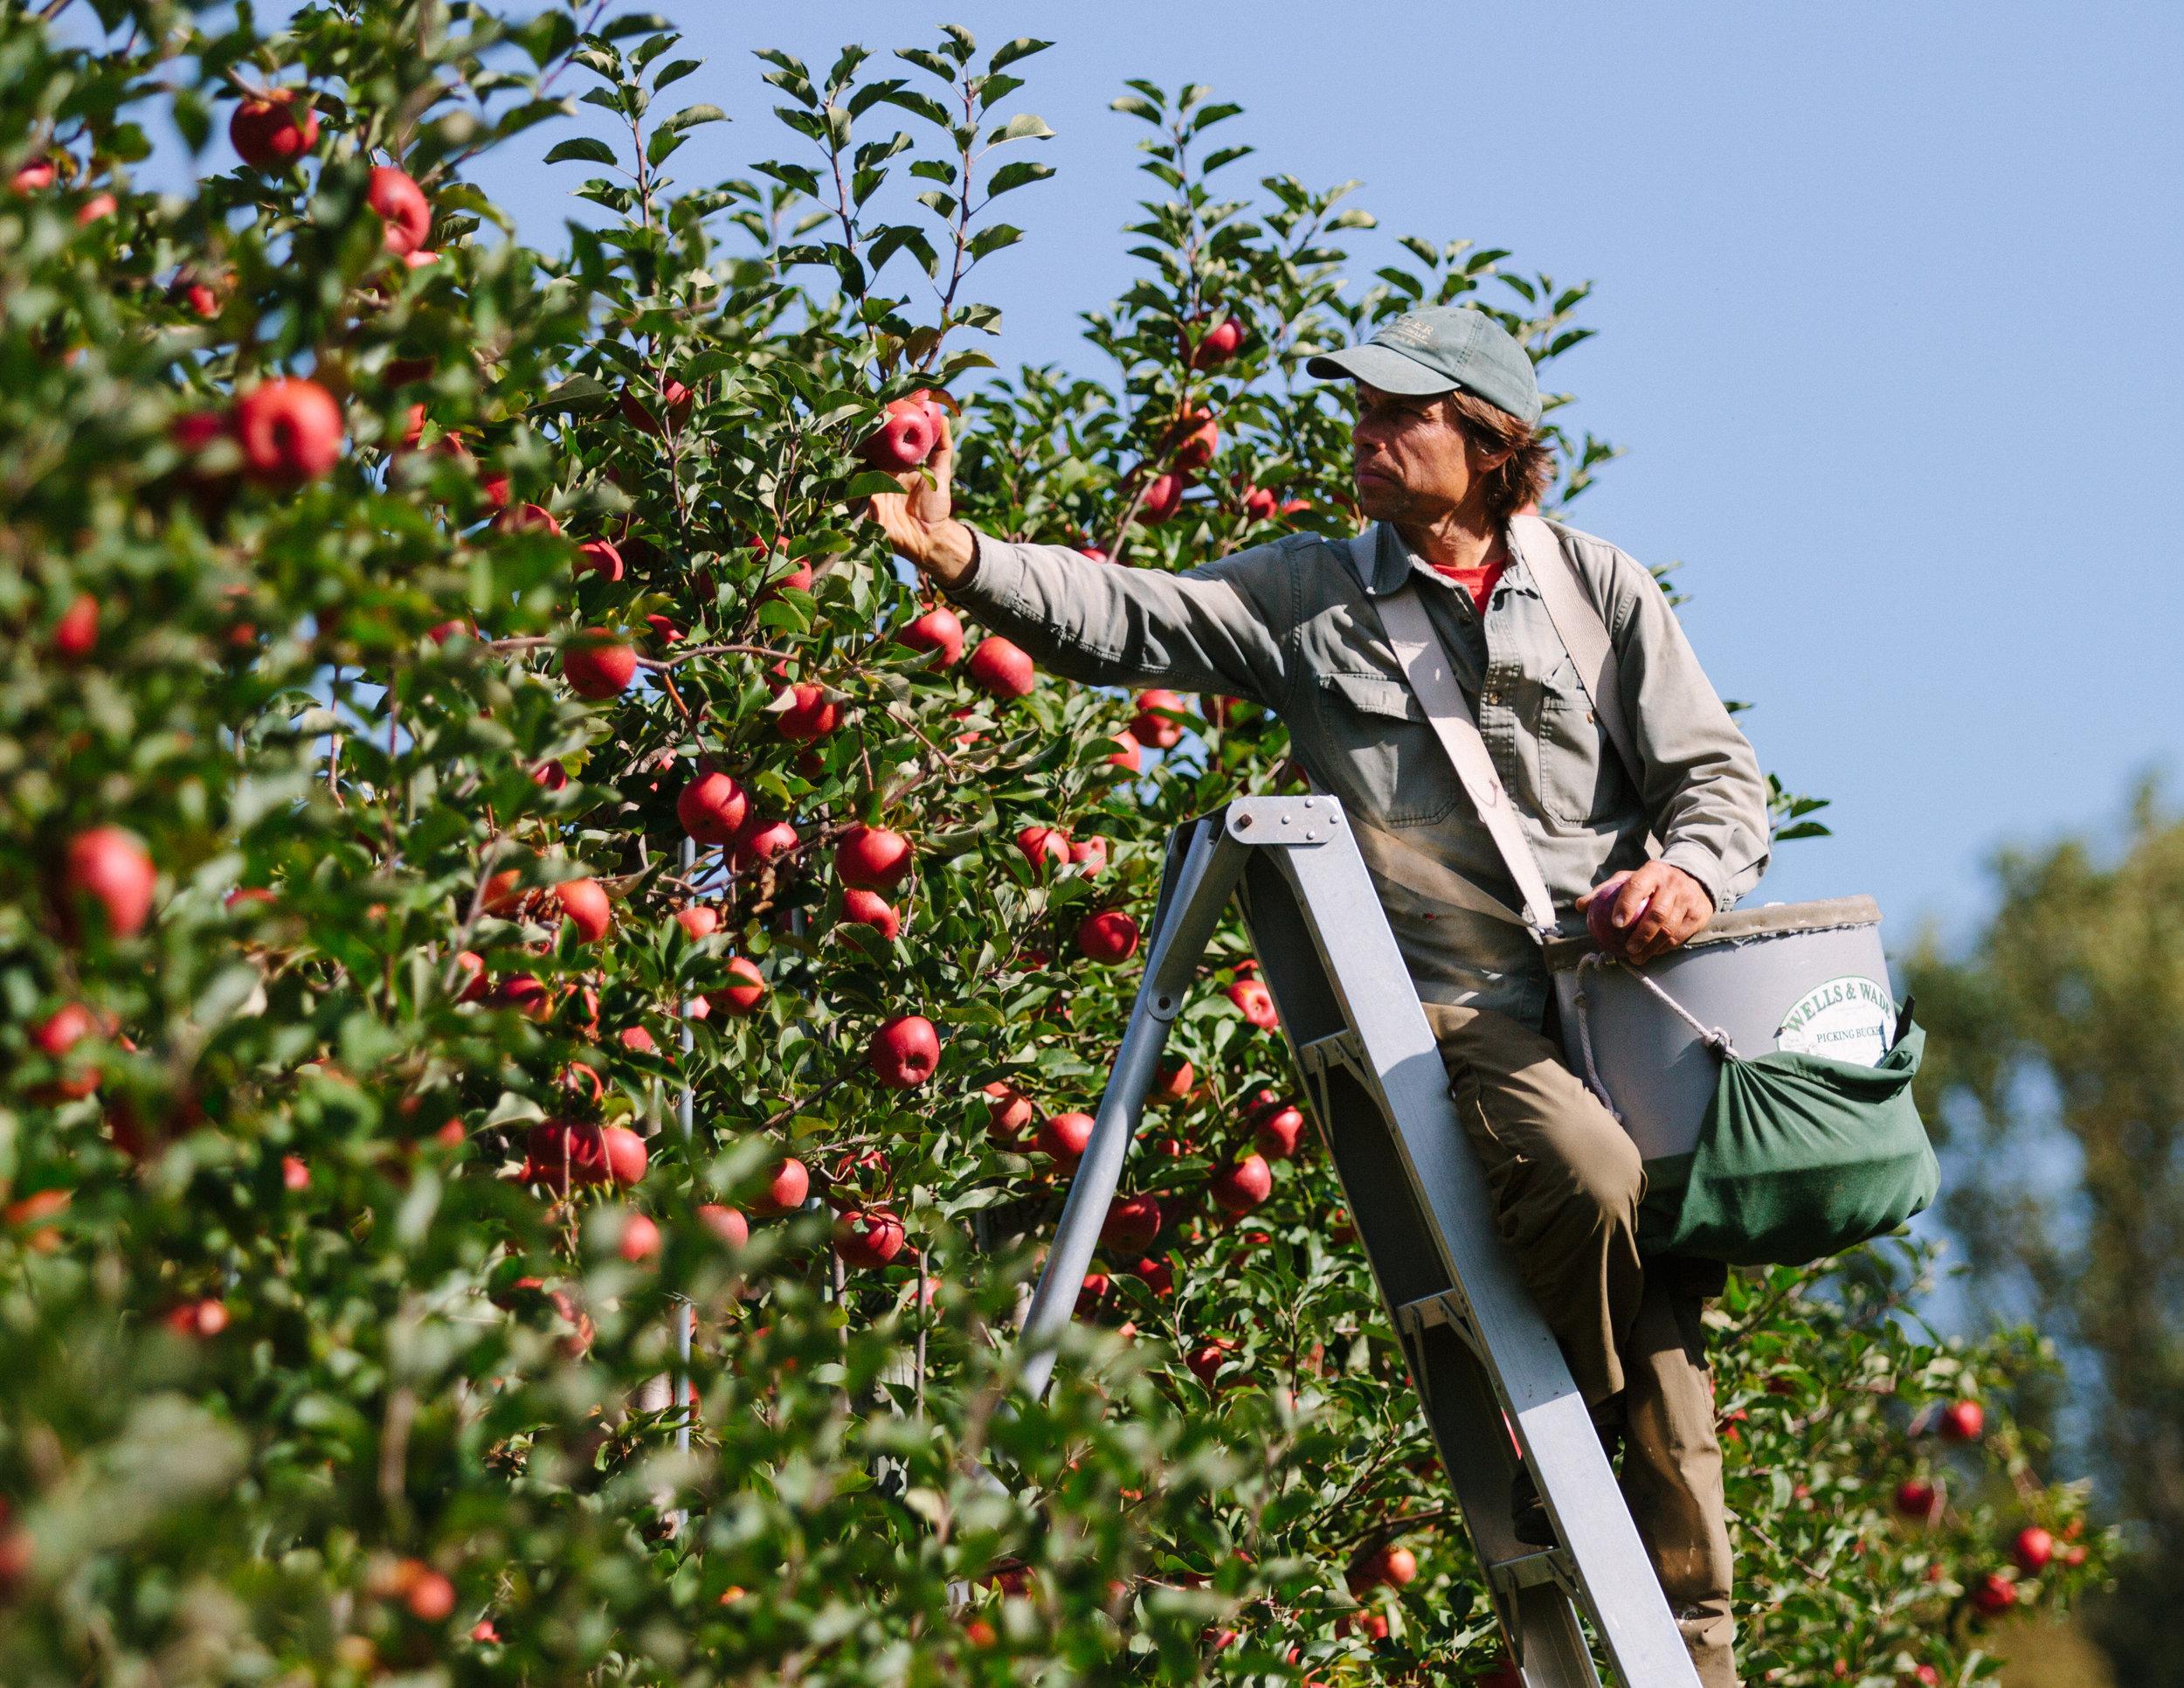 Solebury Orchards, Solebury, PA